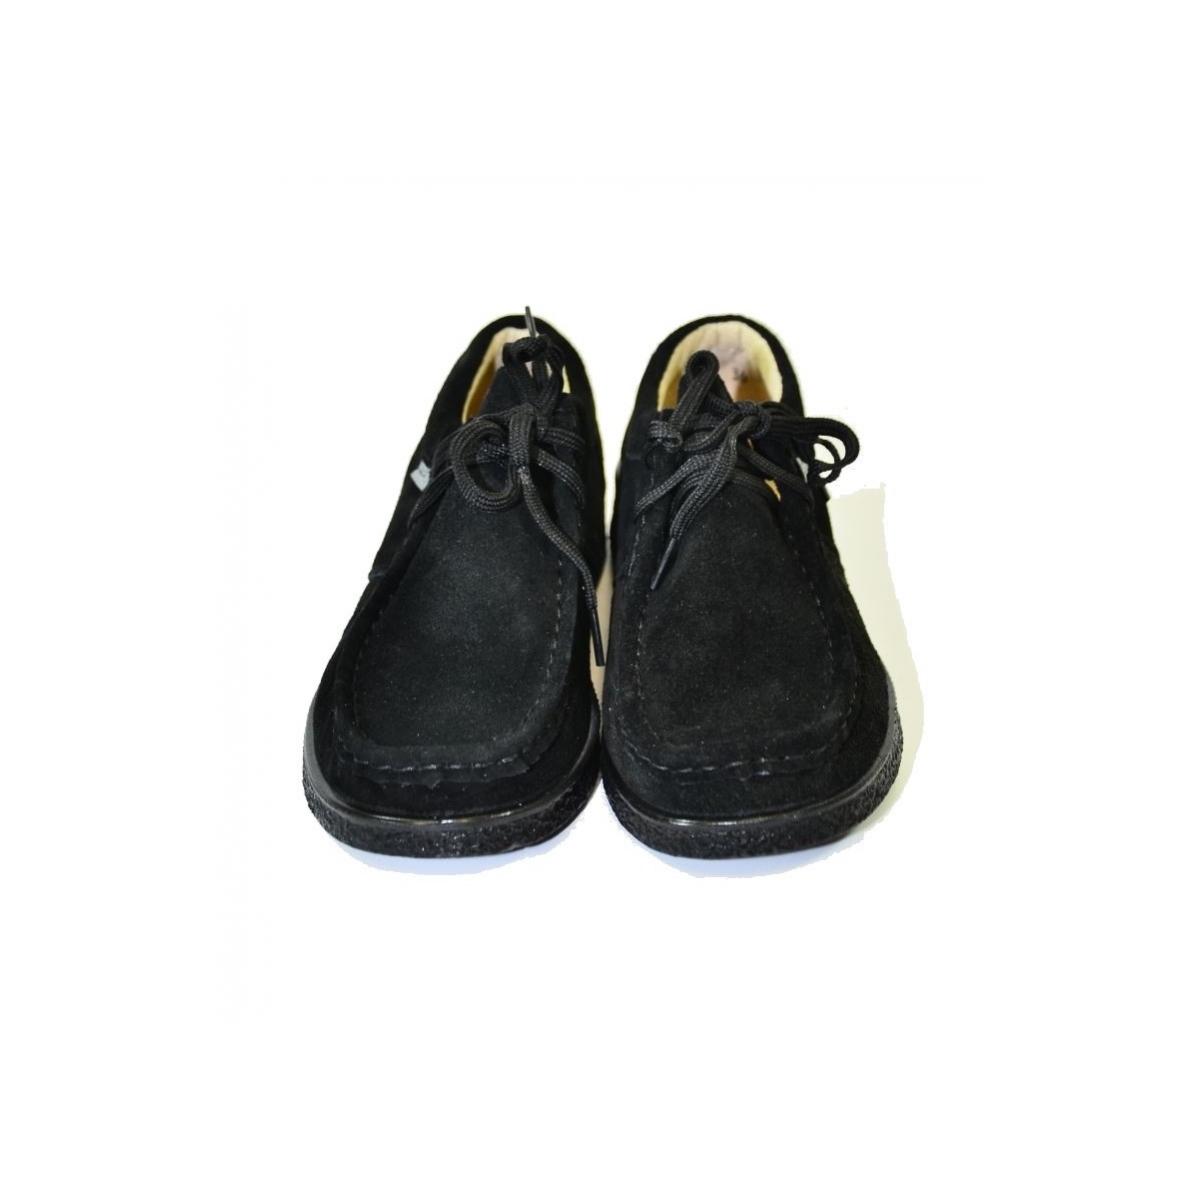 1d472a1dafa3 Dámske čierne topánky ZITA - 3